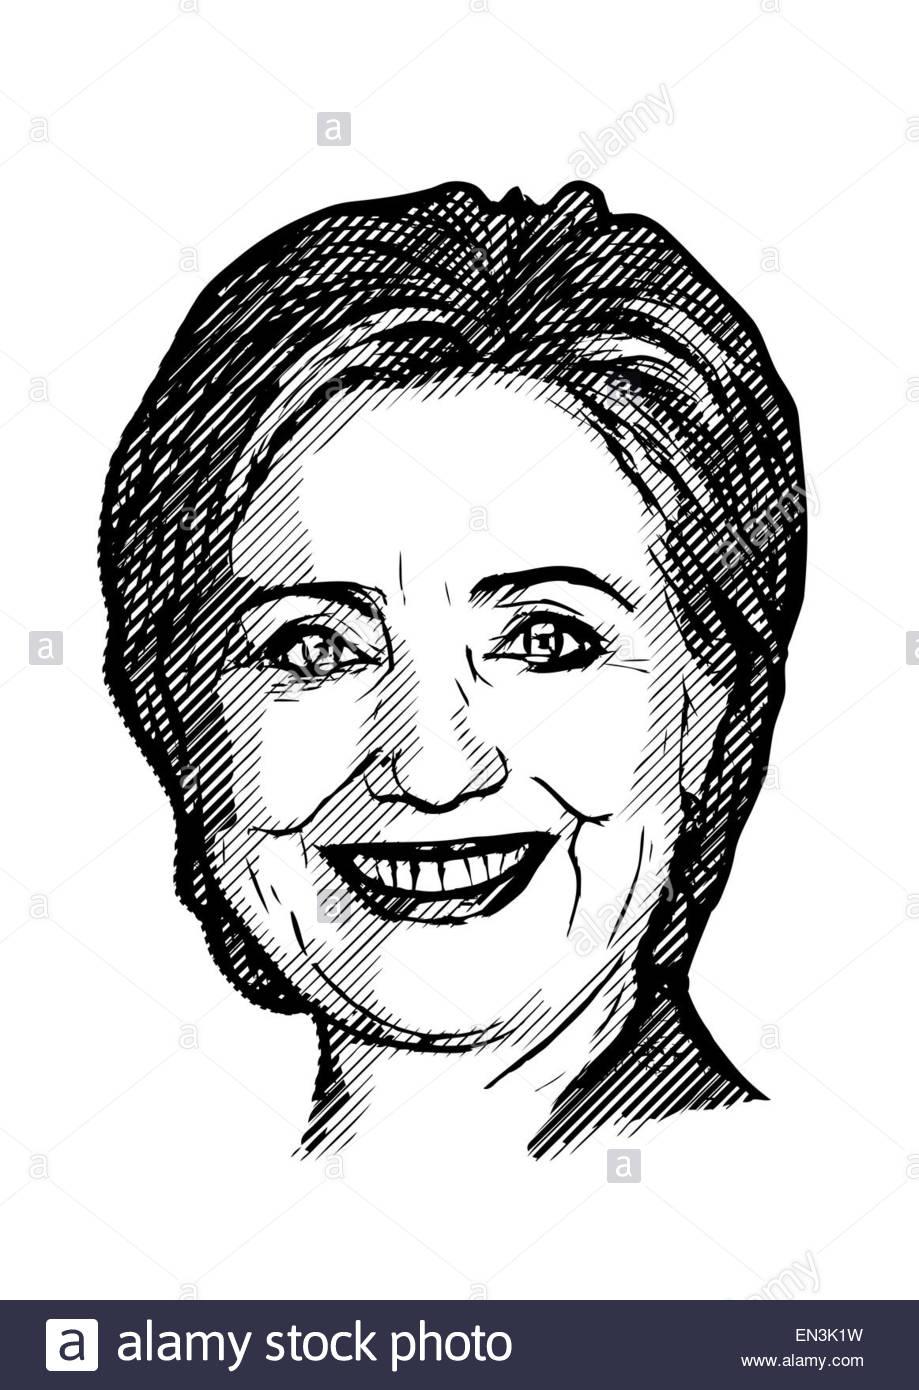 Hillary Clinton Illustration Stock Photo, Royalty Free Image.